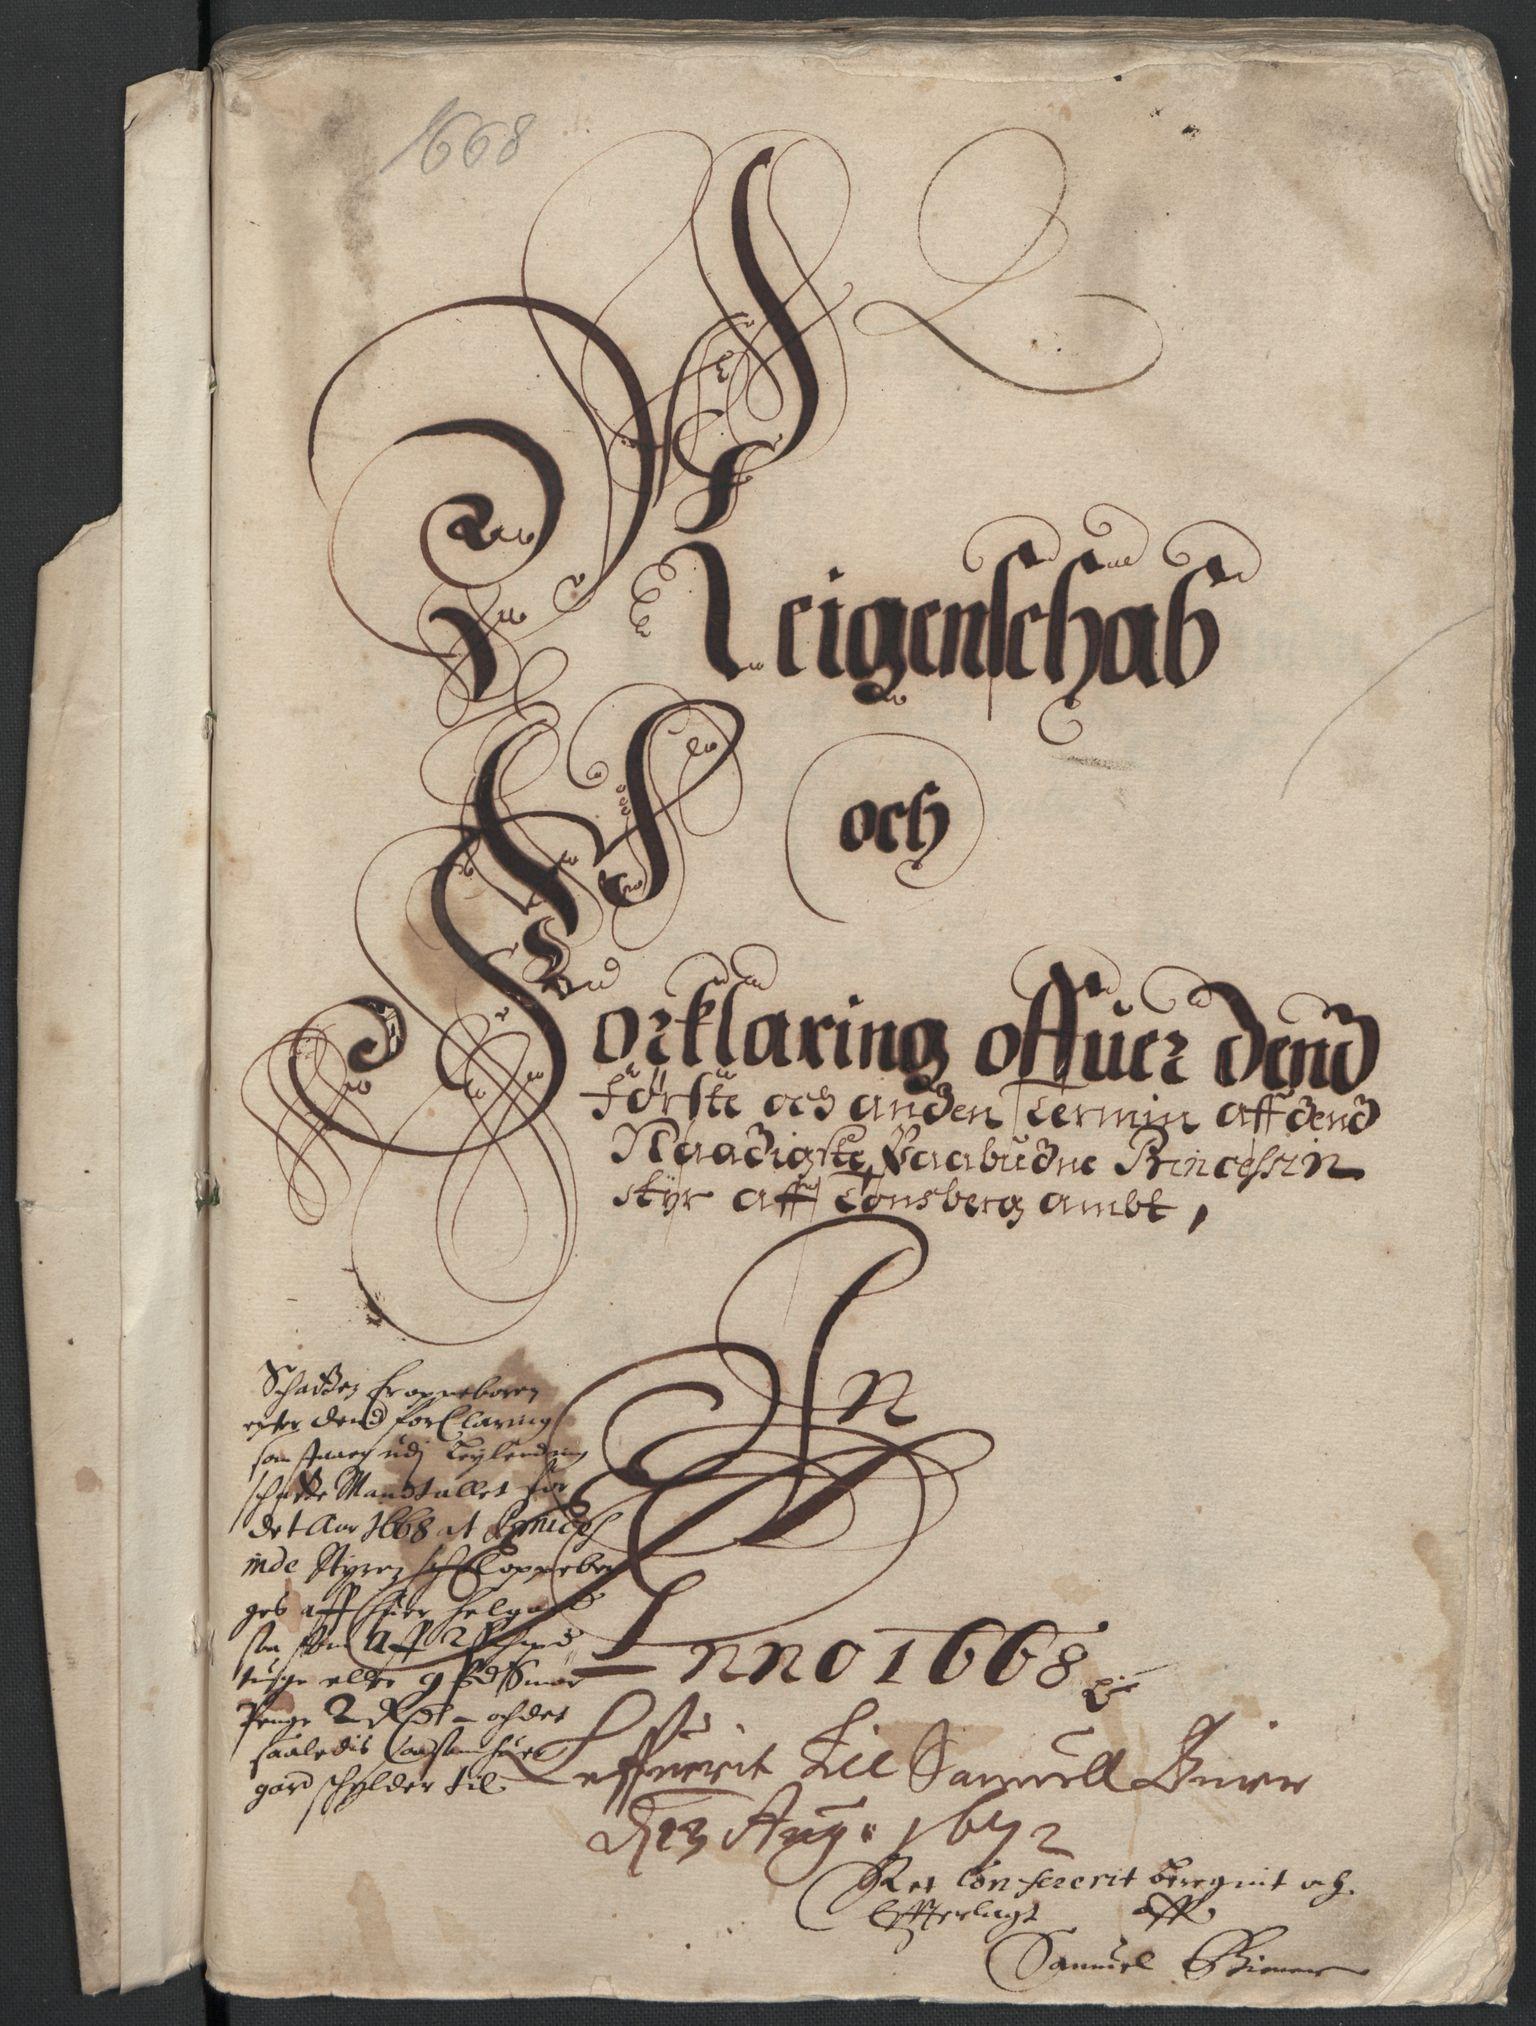 RA, Rentekammeret inntil 1814, Reviderte regnskaper, Fogderegnskap, R32/L1840: Fogderegnskap Jarlsberg grevskap, 1664-1673, s. 171